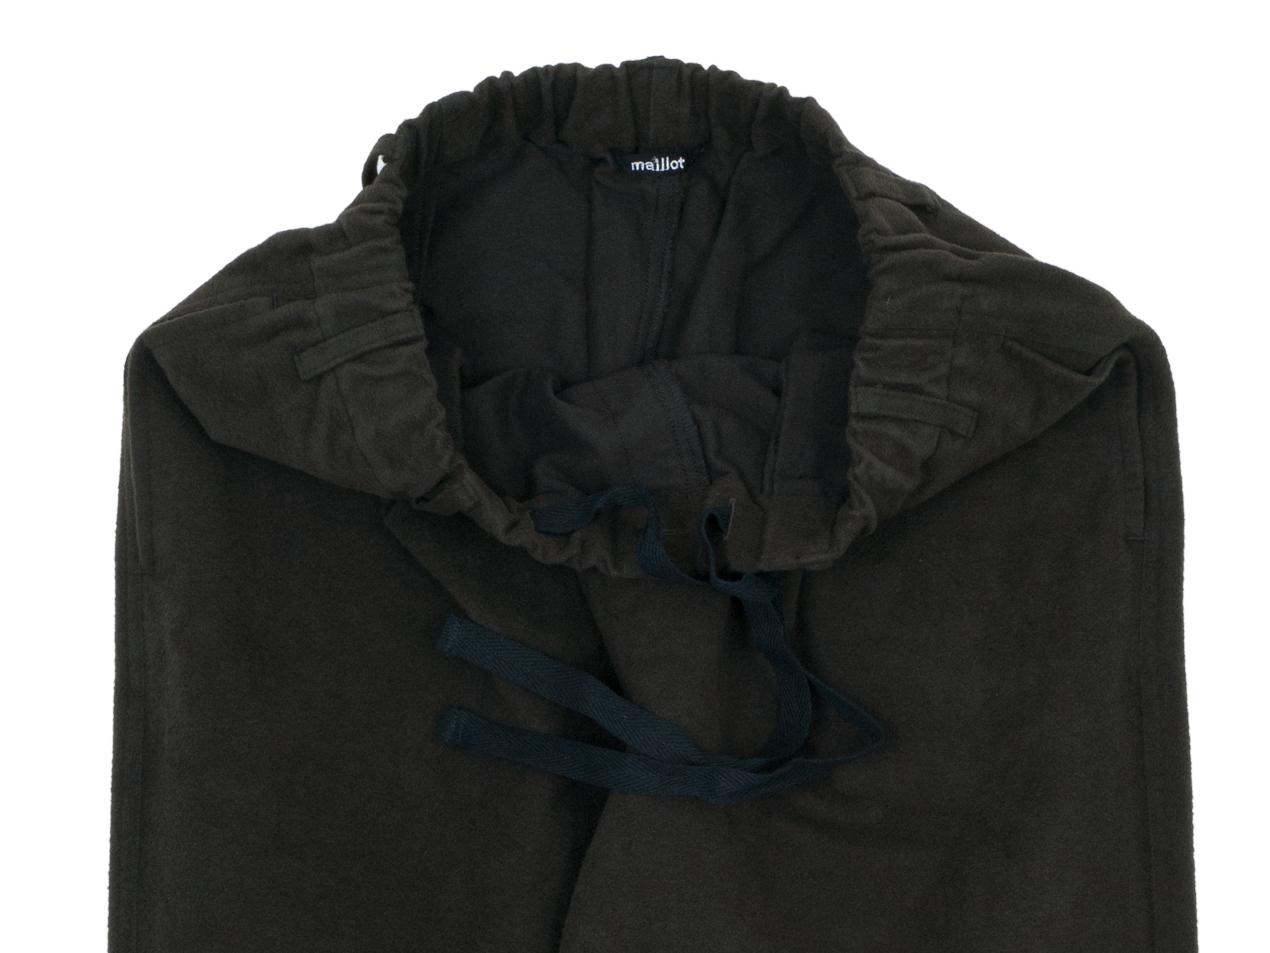 maillot mature cotton nel easy pants